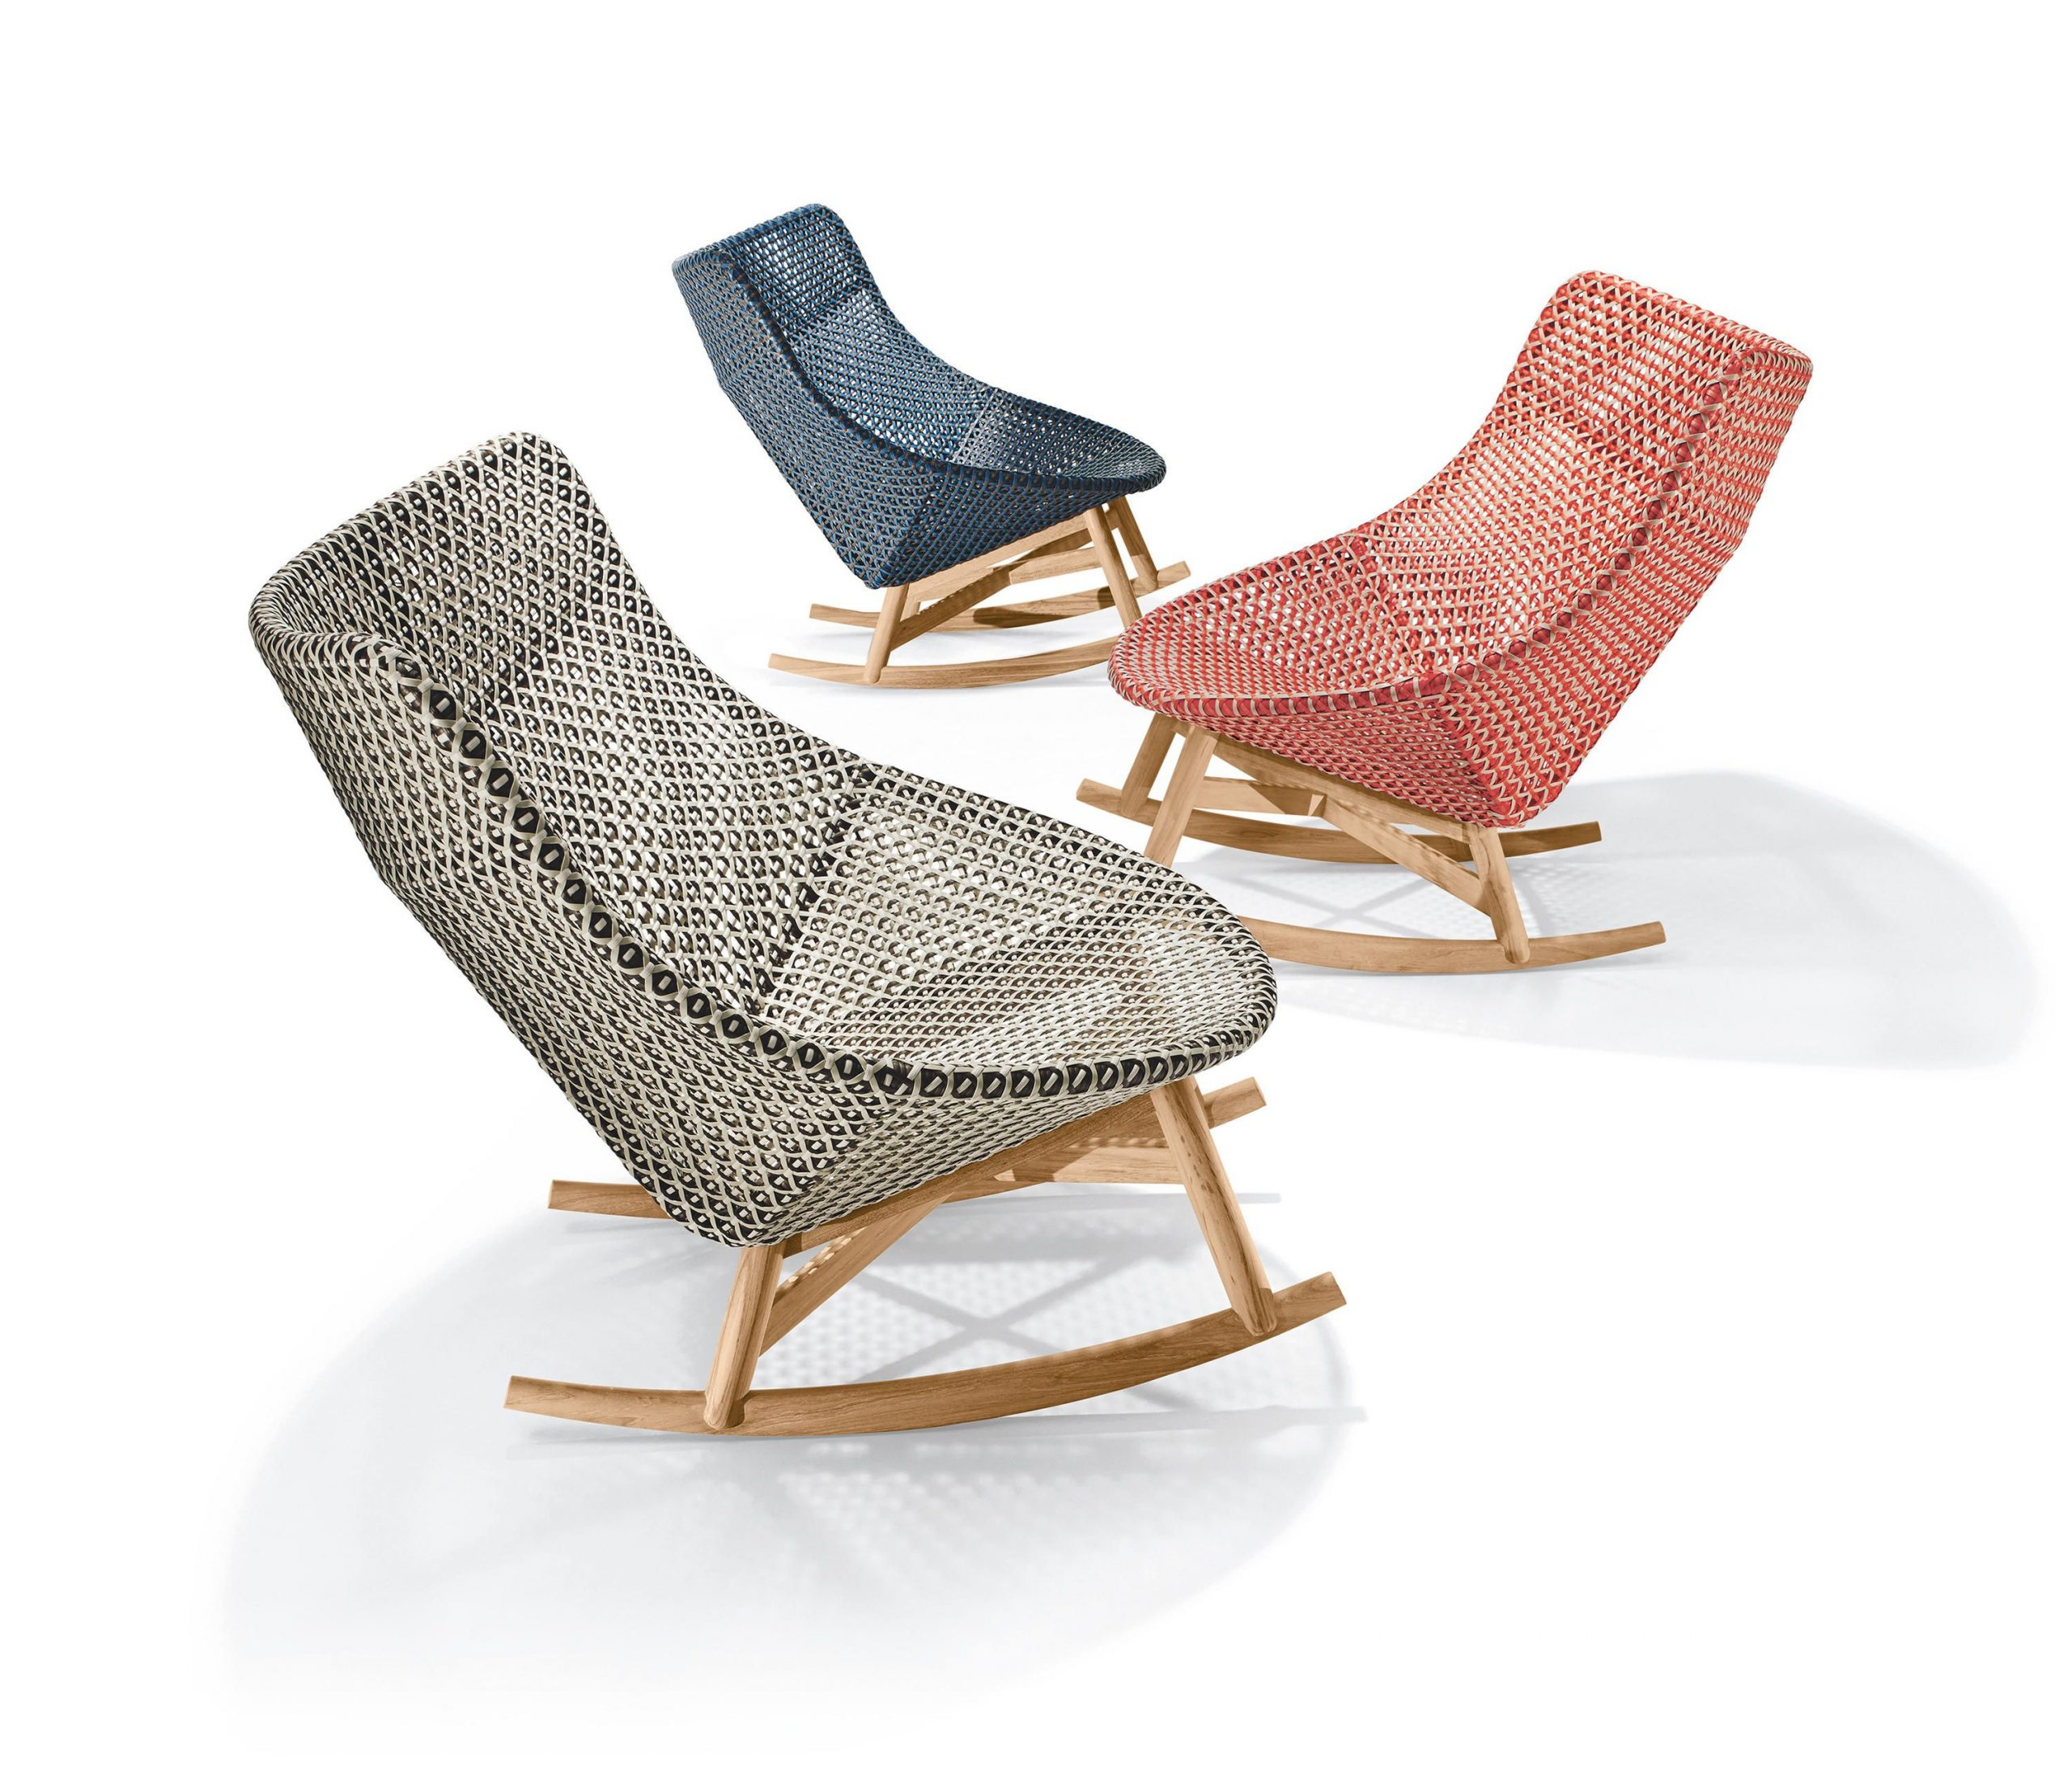 Mbrace Lounge Chair - Garden Armchairs From Dedon ... tout Coussin Fauteuil Jardin Haut Dossier